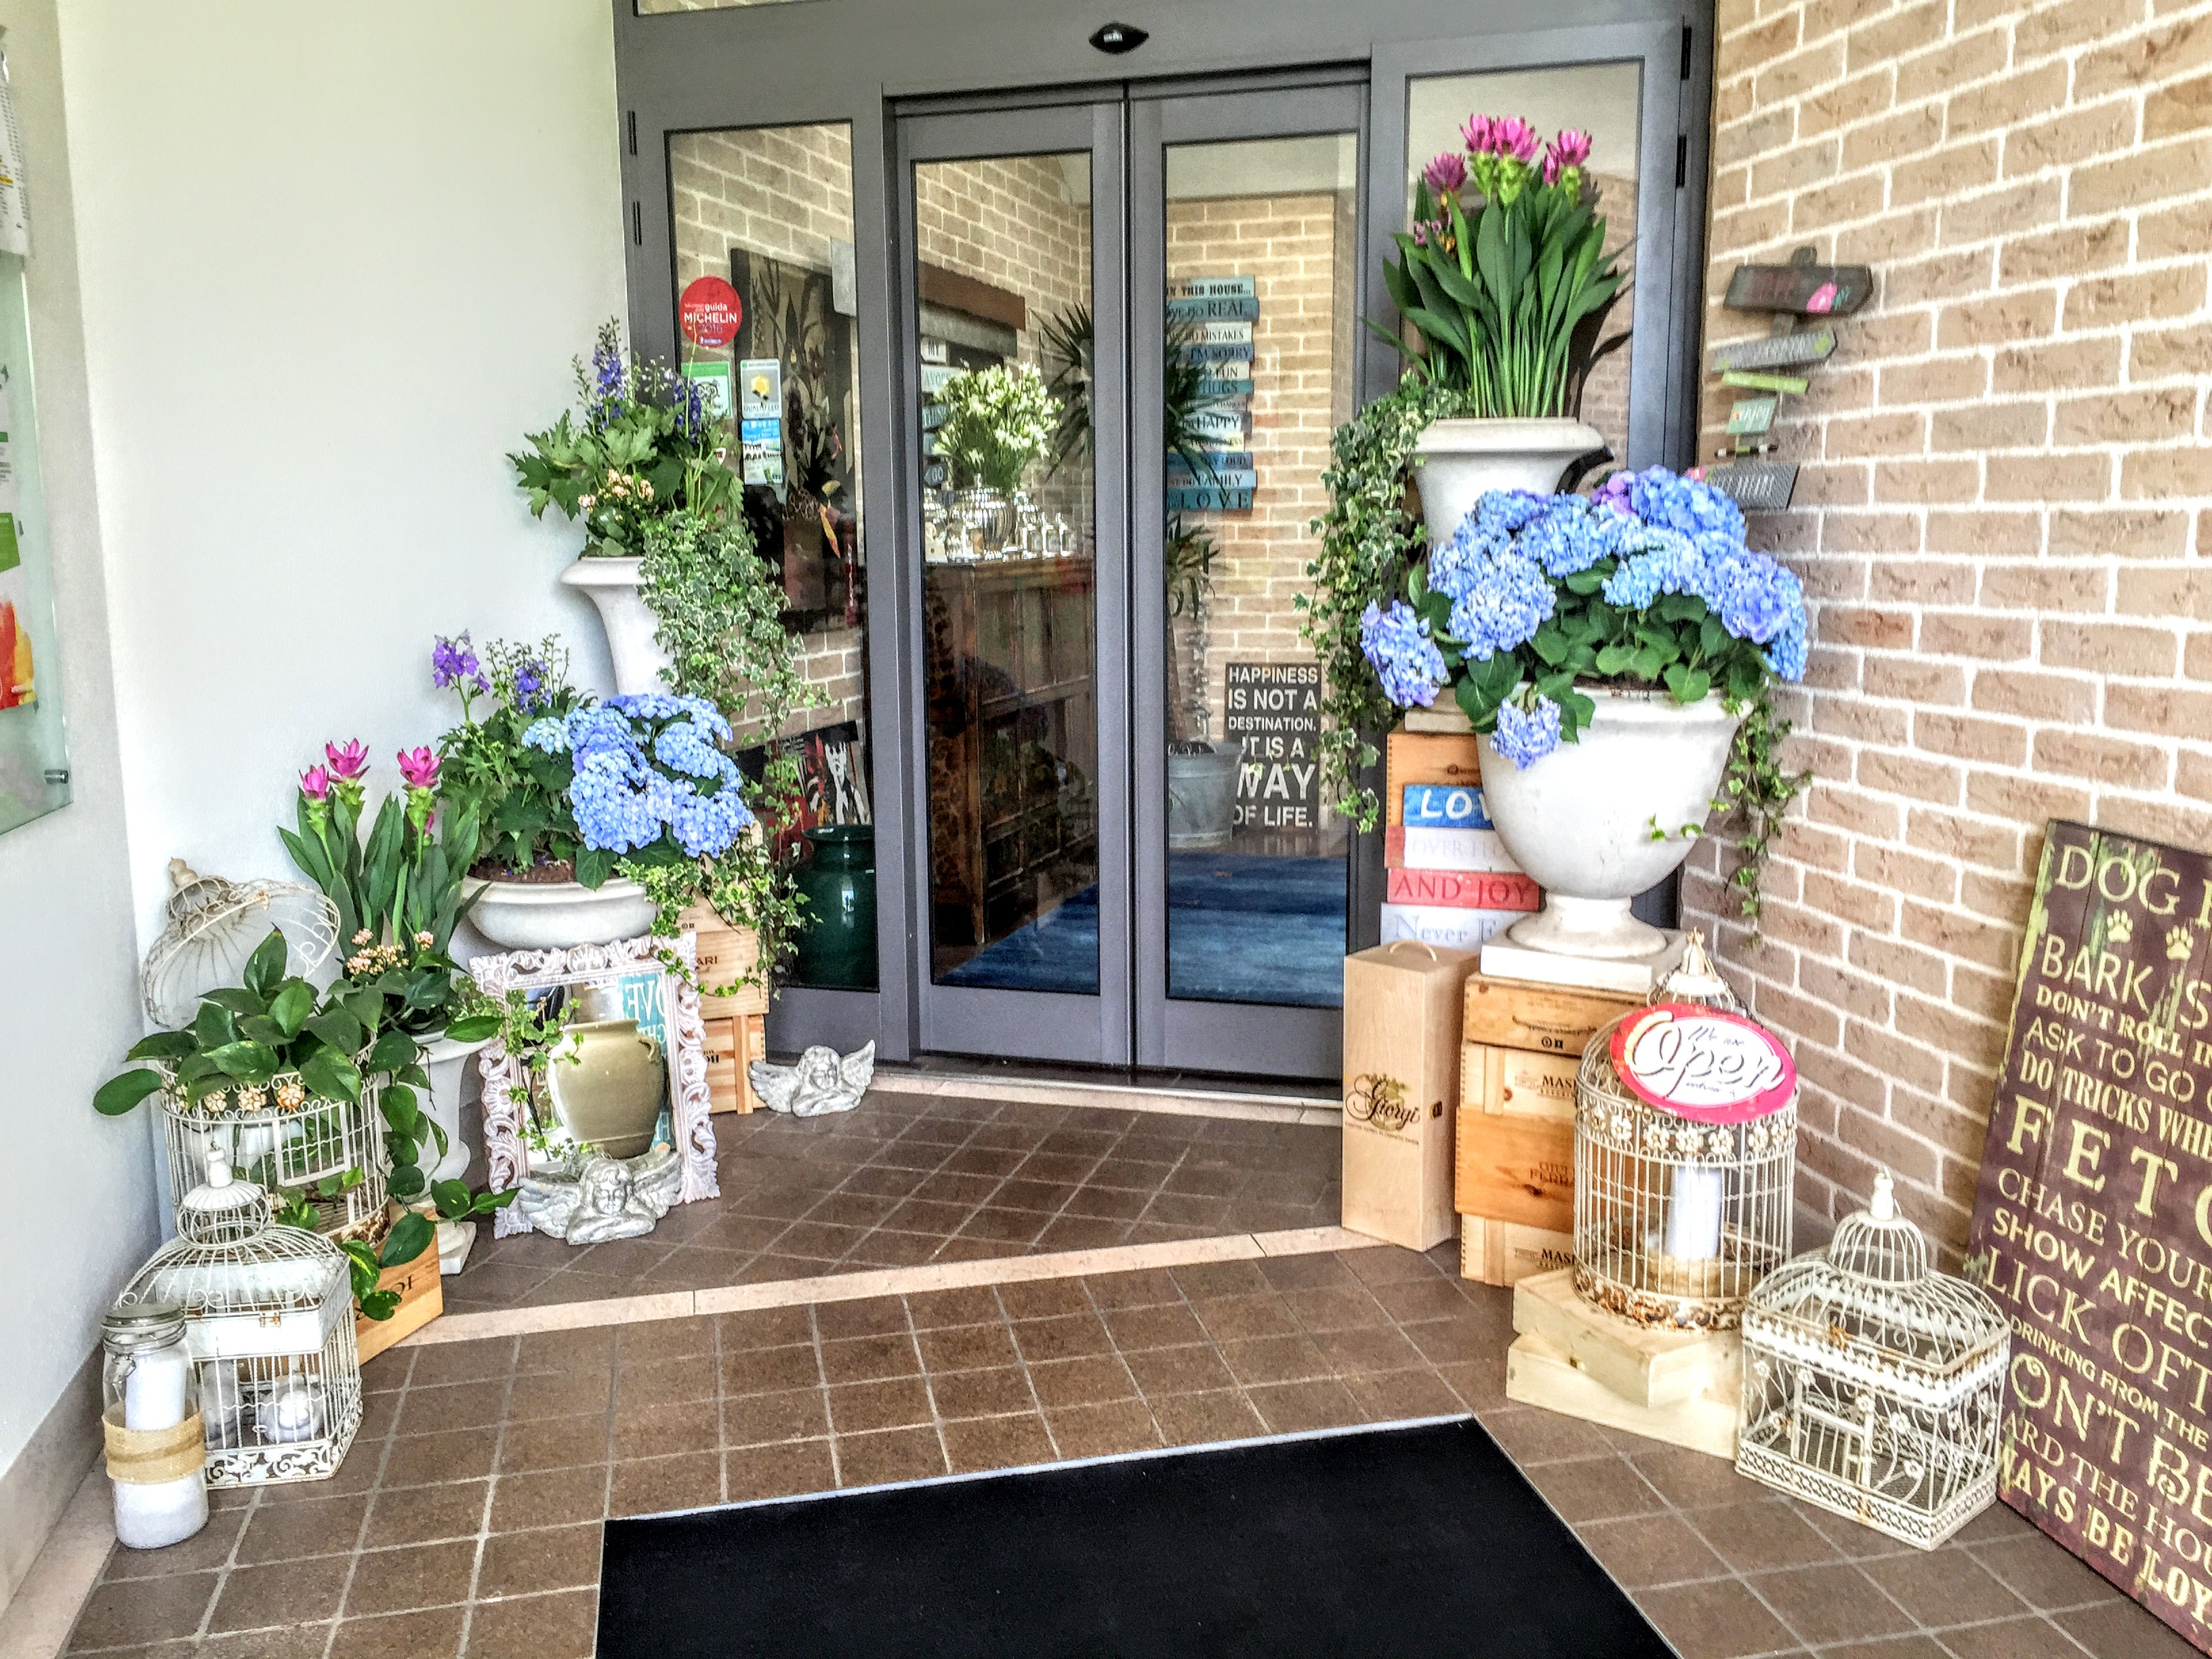 ingresso ristorante location per matrimoni